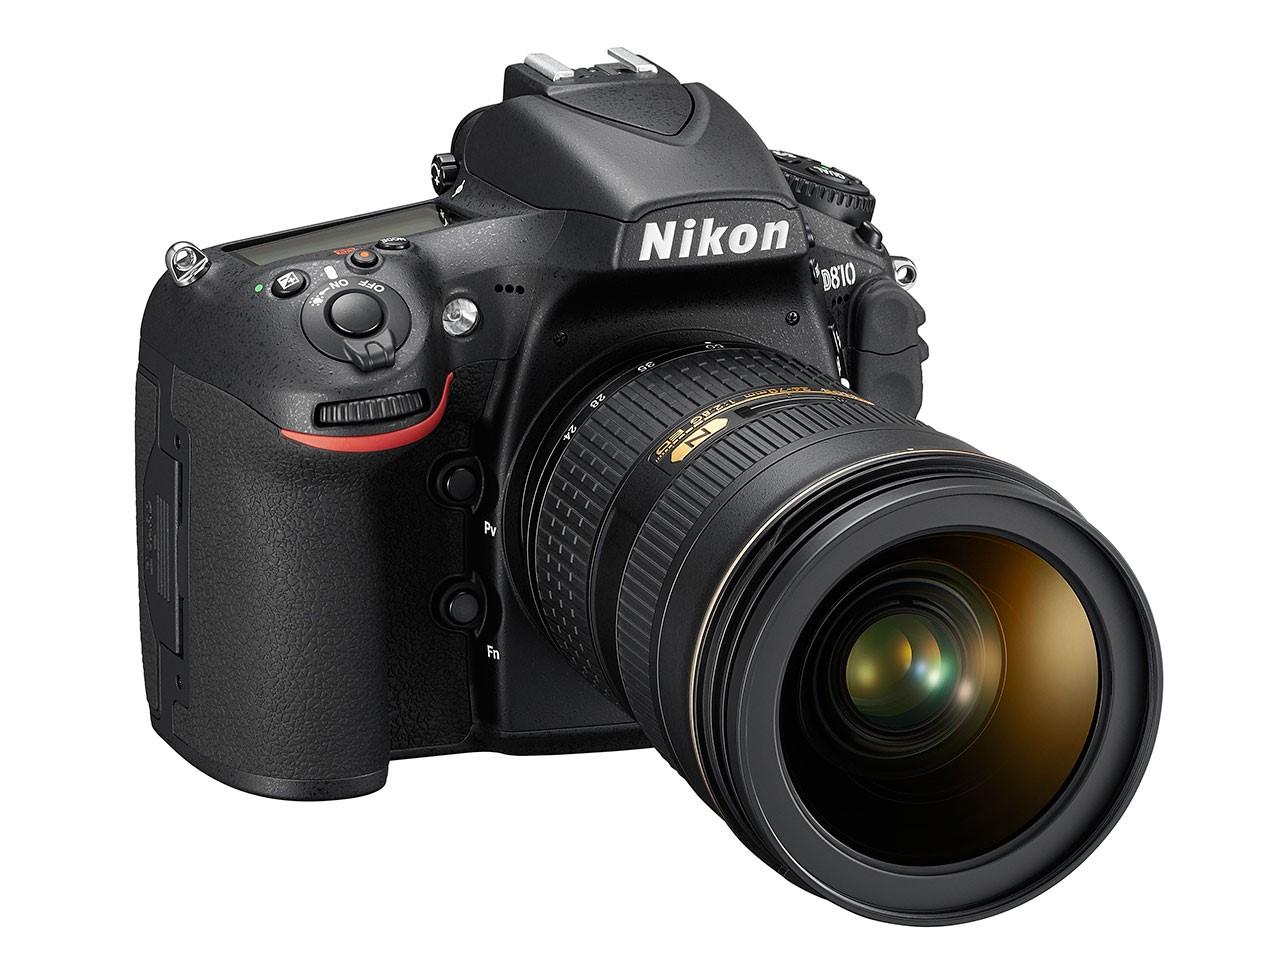 Camera New Nikon Dslr Cameras 2014 nikon d810 camera news at cameraegg part 4 d810